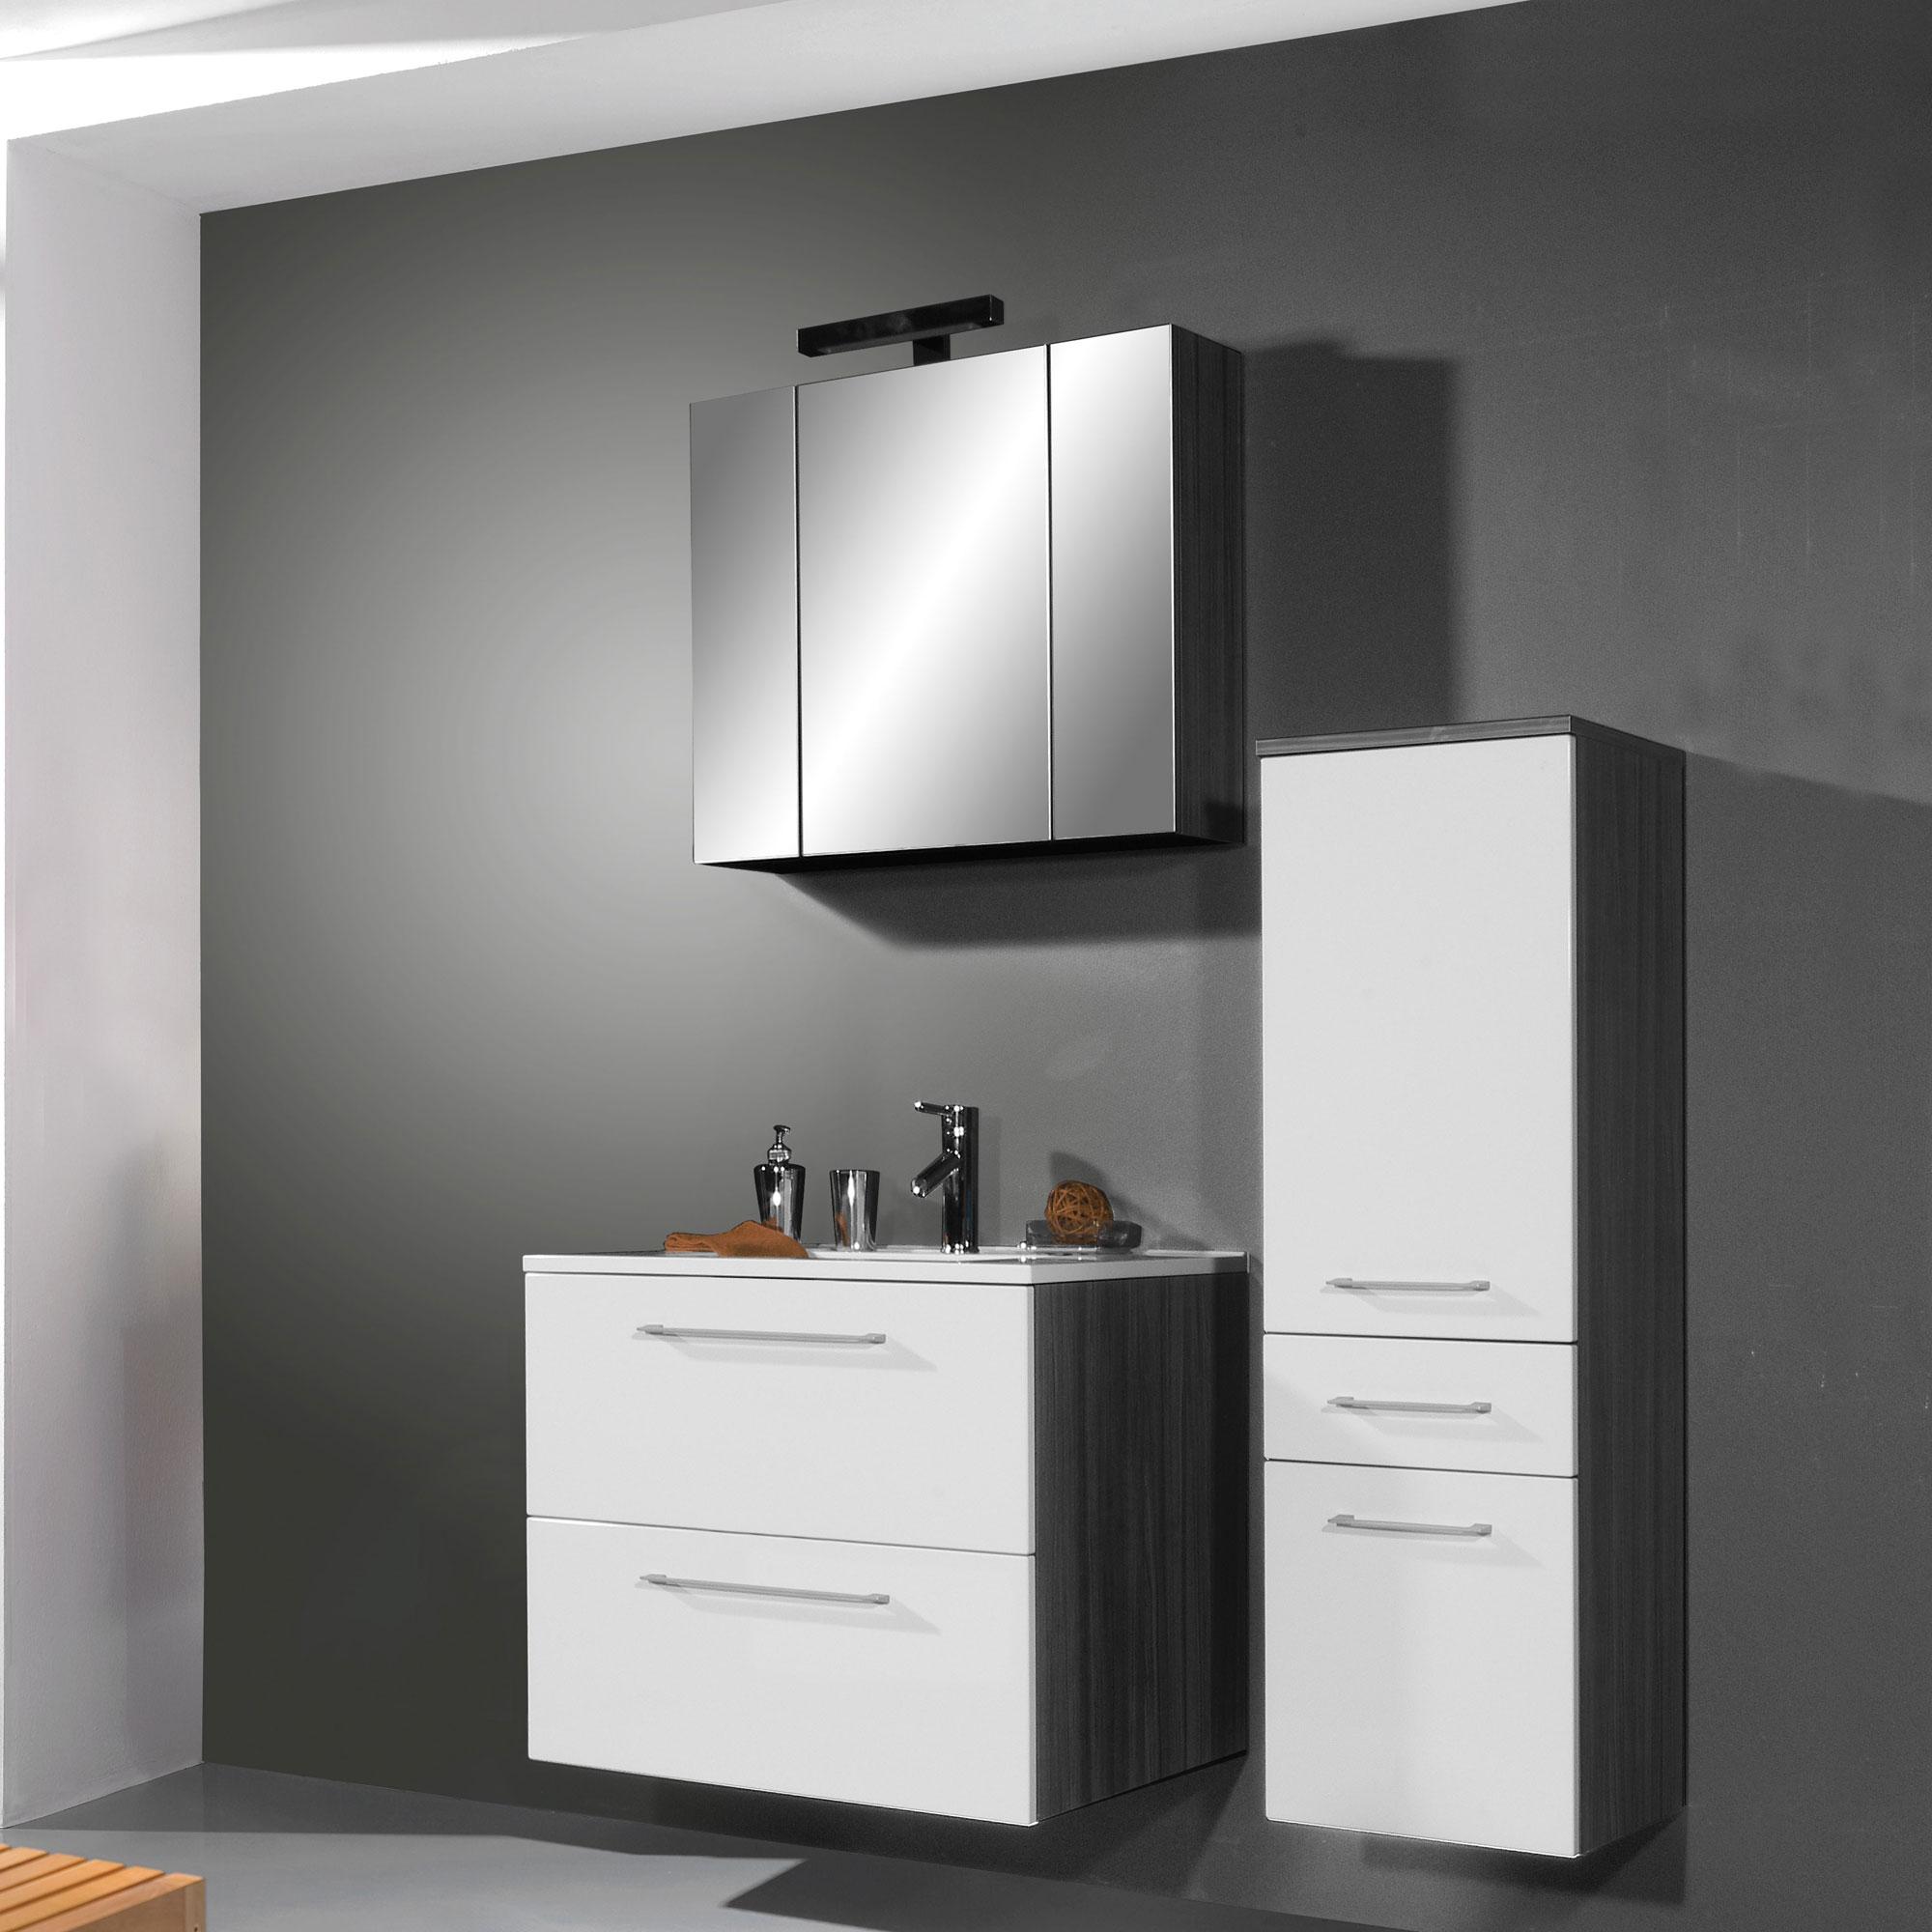 Meuble salle de bain avec colonne for Castorama meubles salle de bains